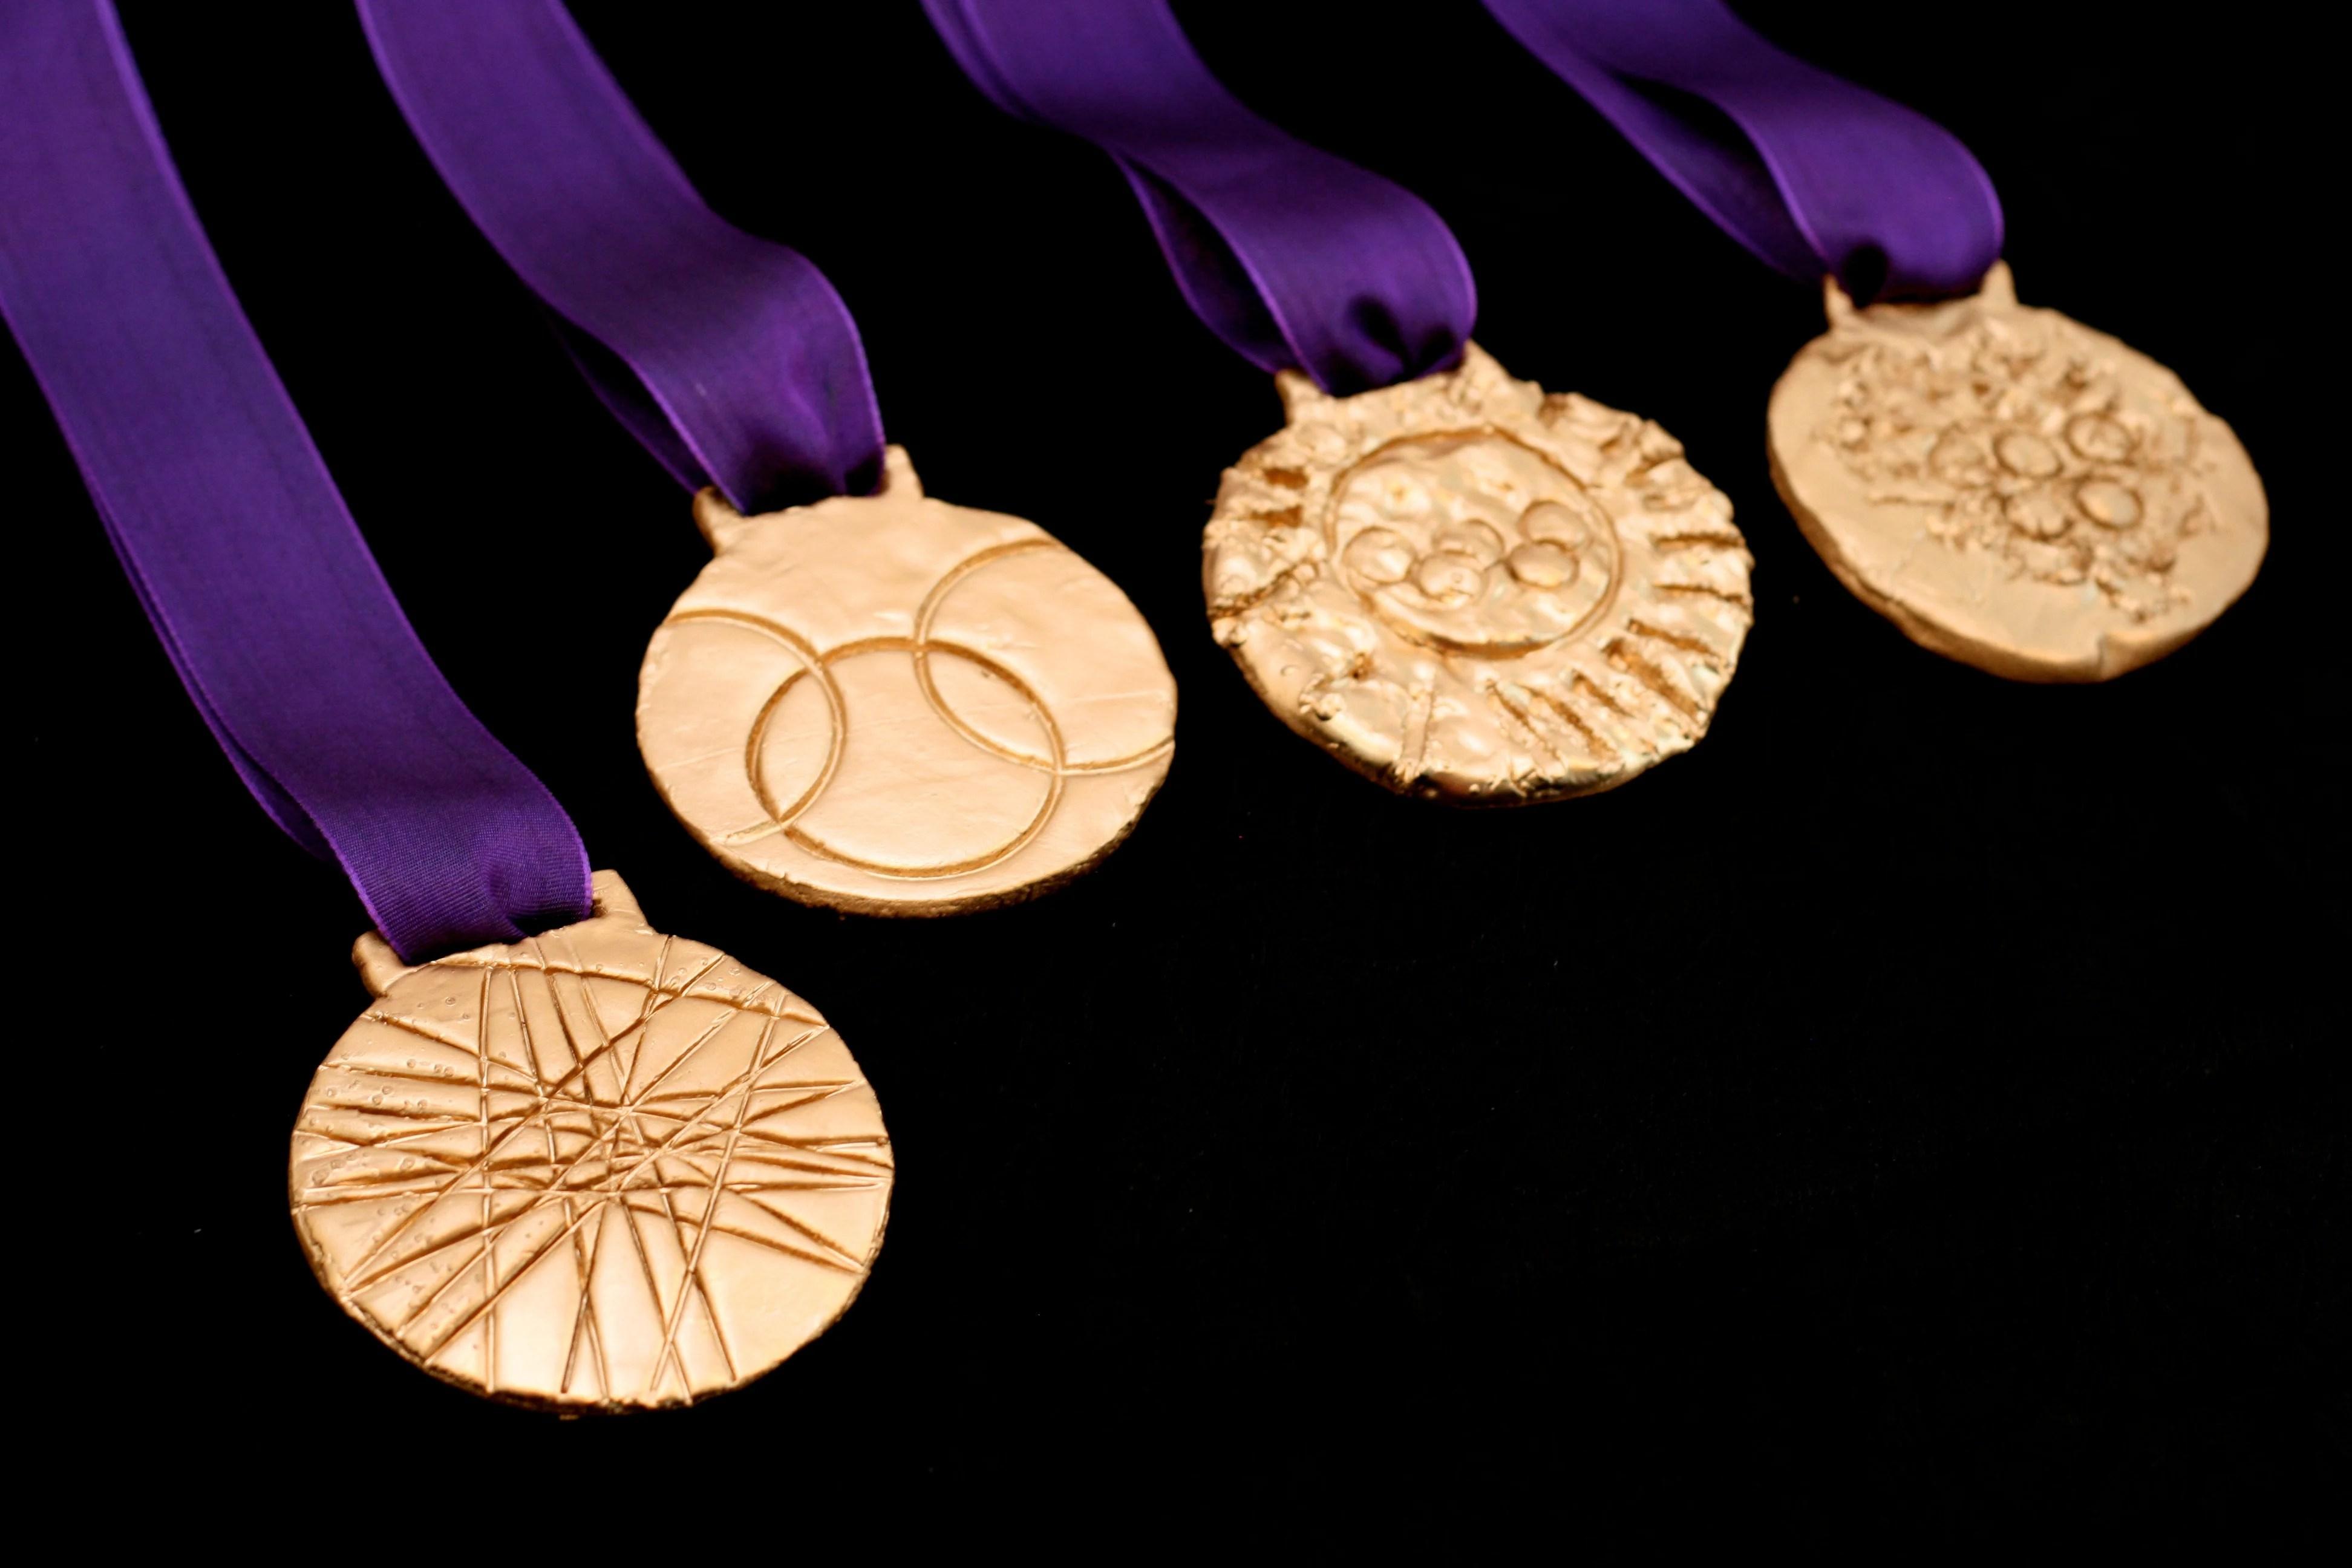 Make A Gold Medal